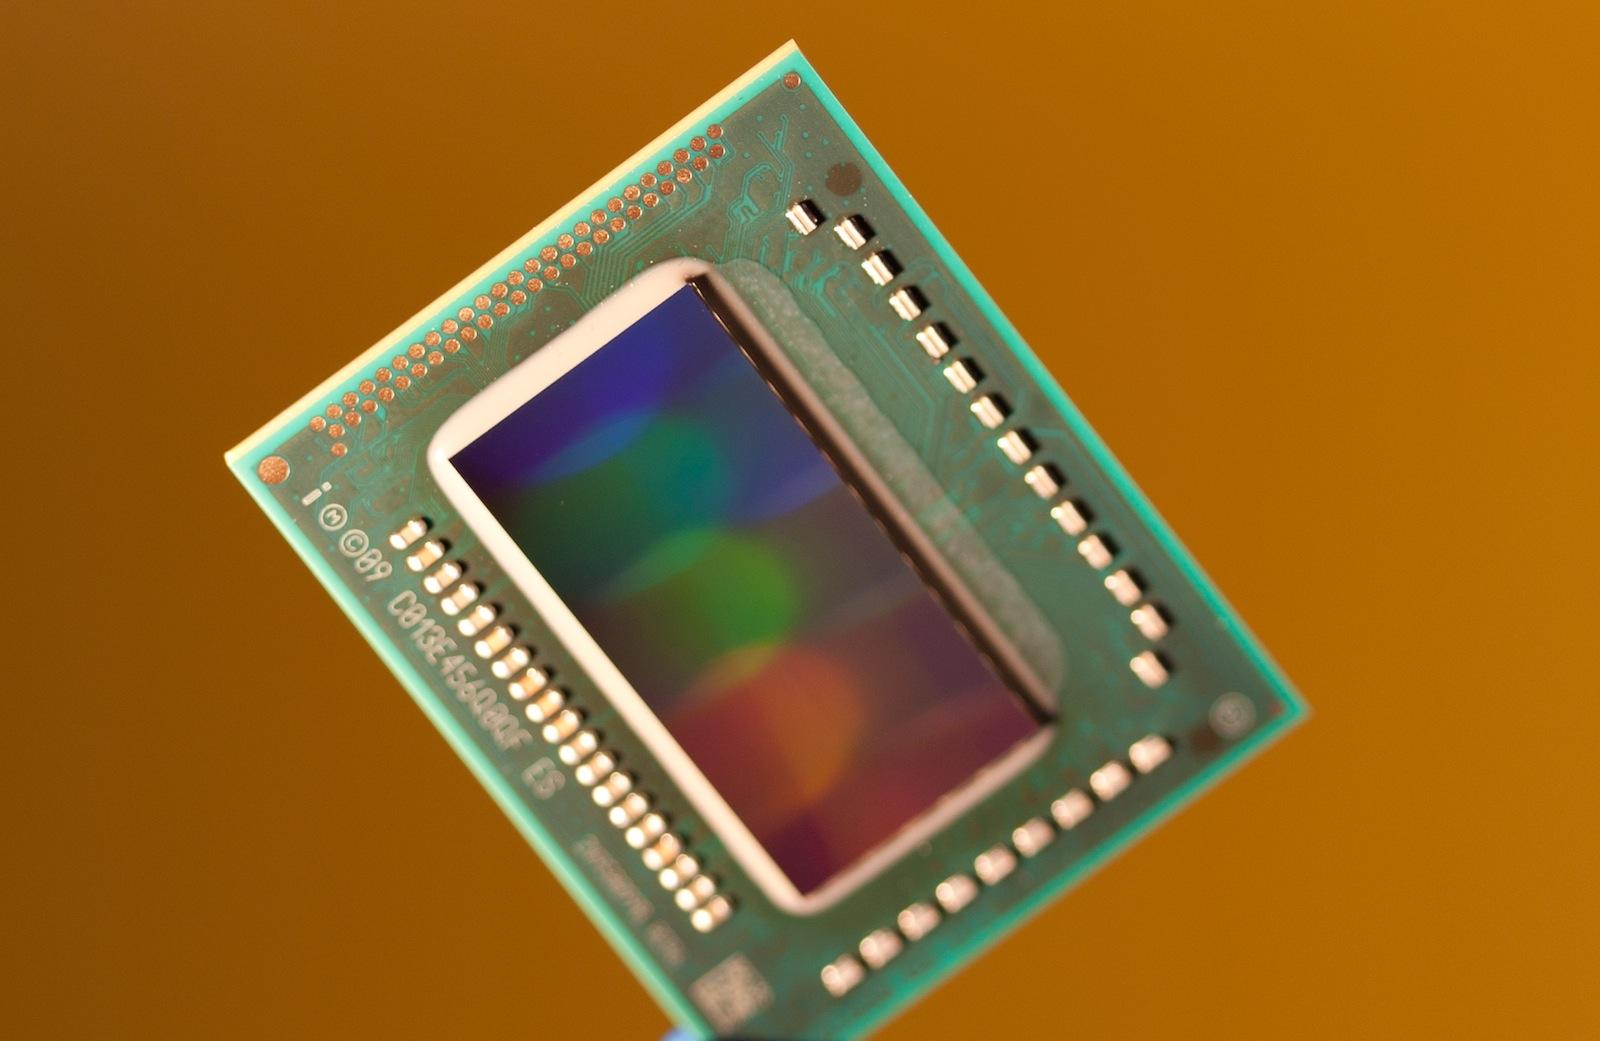 Intel Core I7 2820qm Notebook Processor Notebookcheck